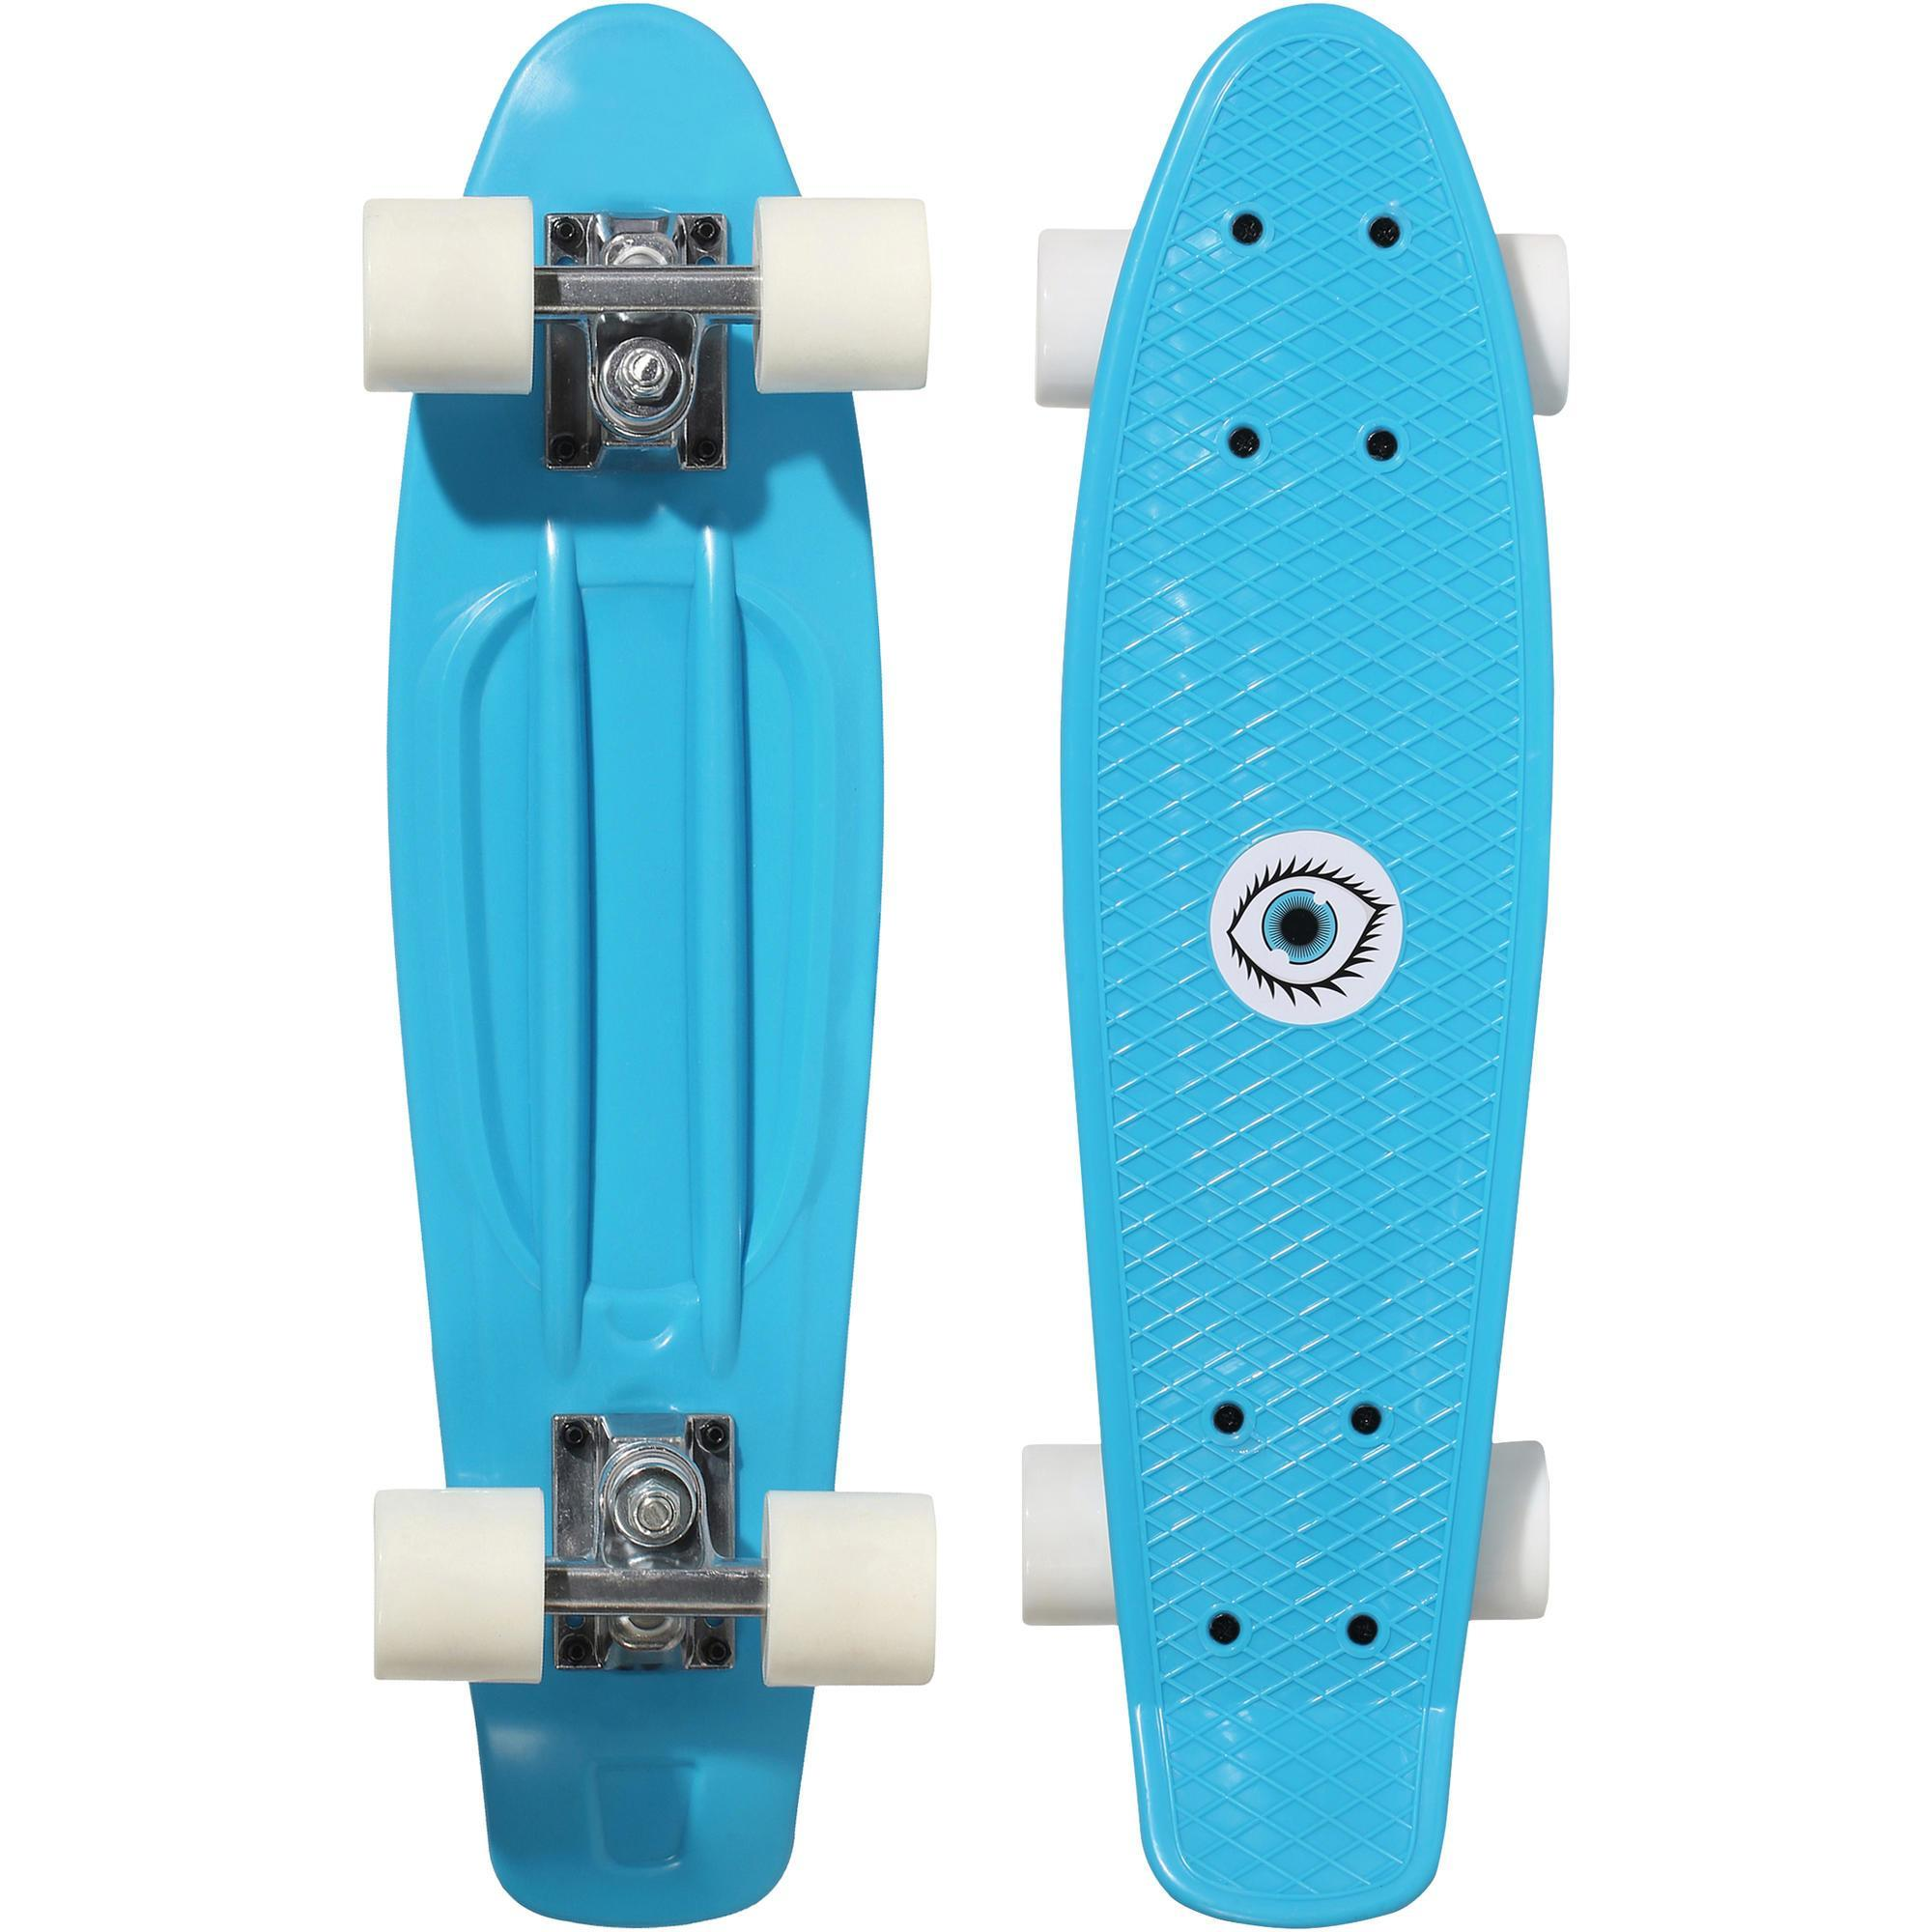 6a7eee6b980 Tabla Skate OXELO Mini Niños Plástico Azul Oxelo   Decathlon